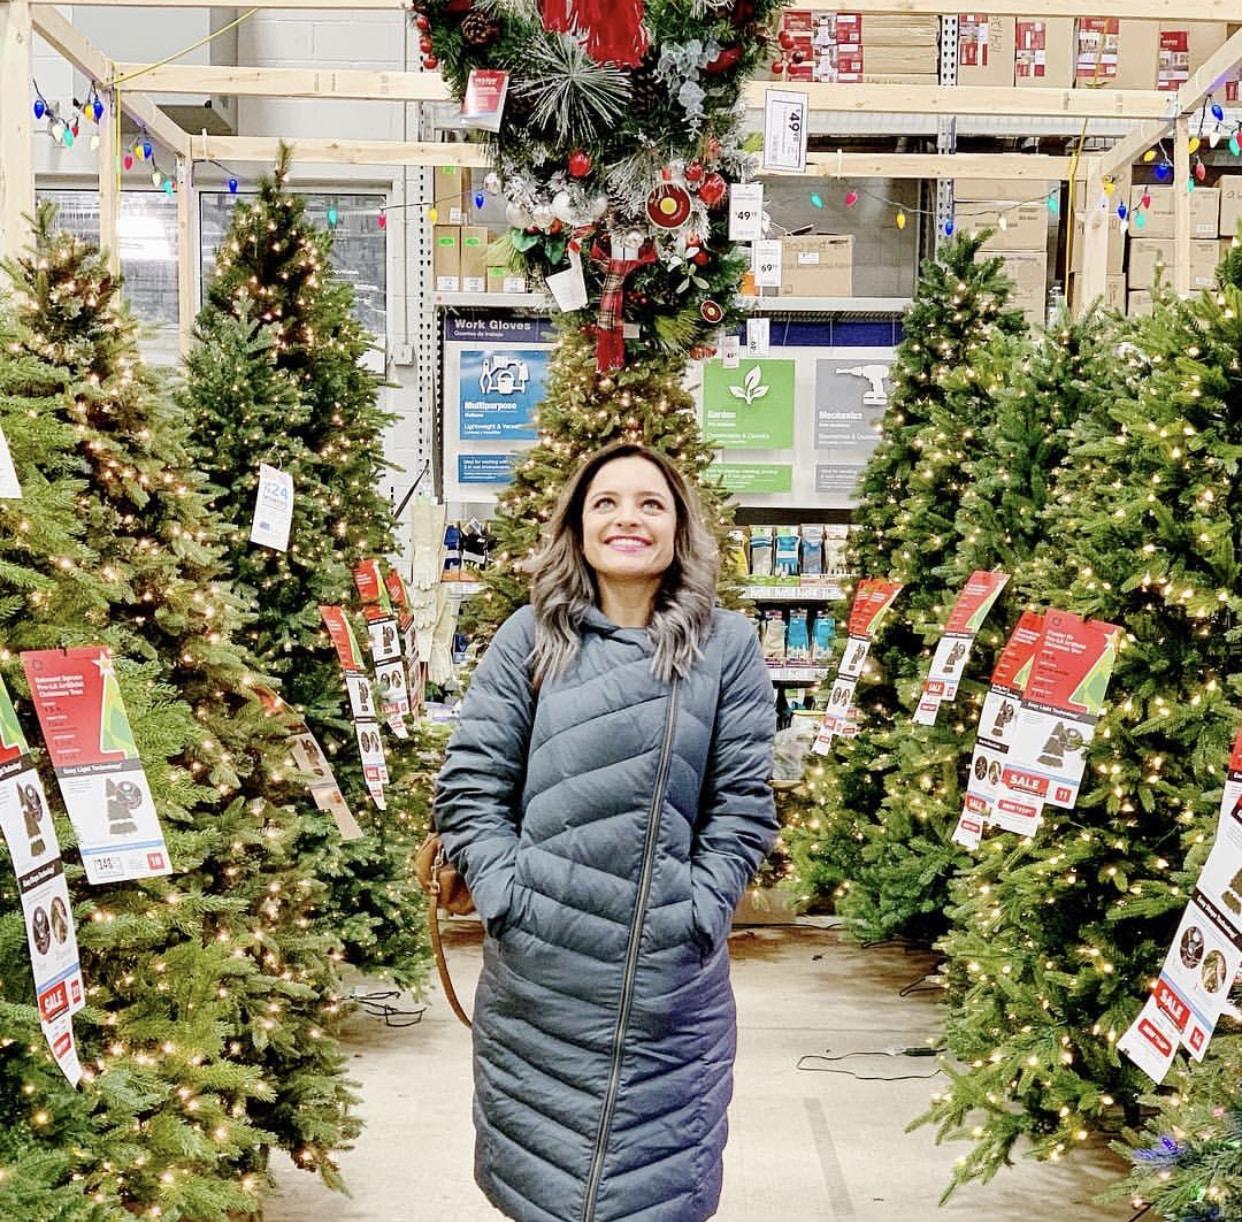 Women_Next_To_Christmas_Tree